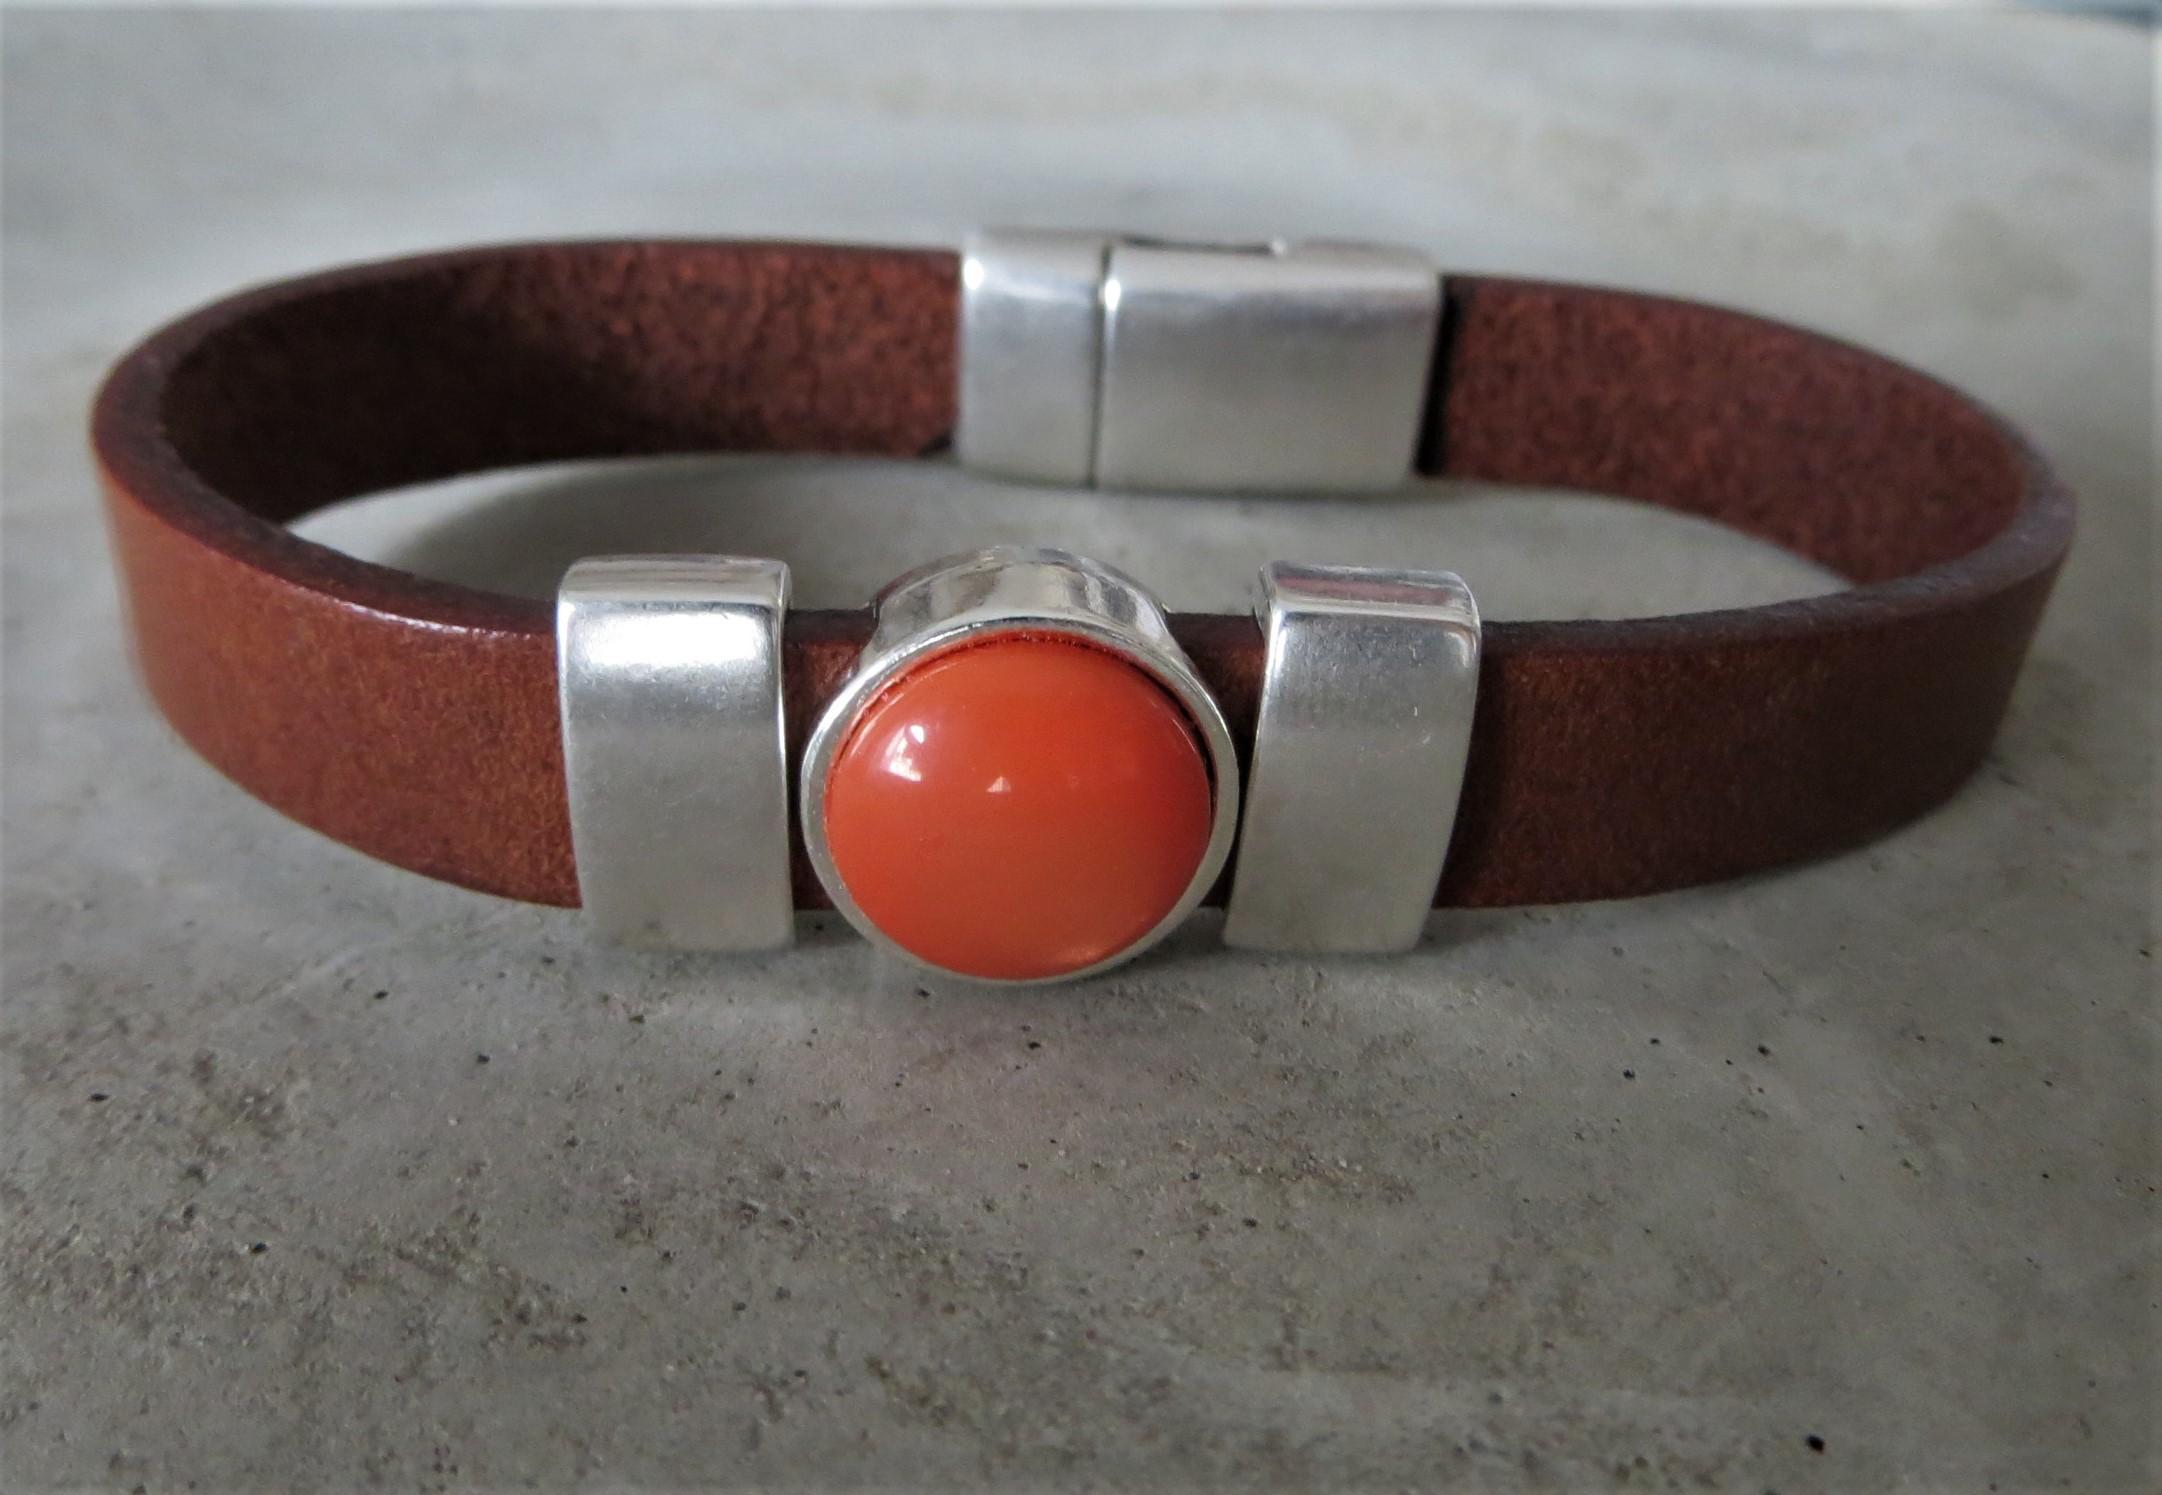 Armbaender - QOSS Armband KIM Braun Orange L  - Onlineshop Tante Emmer